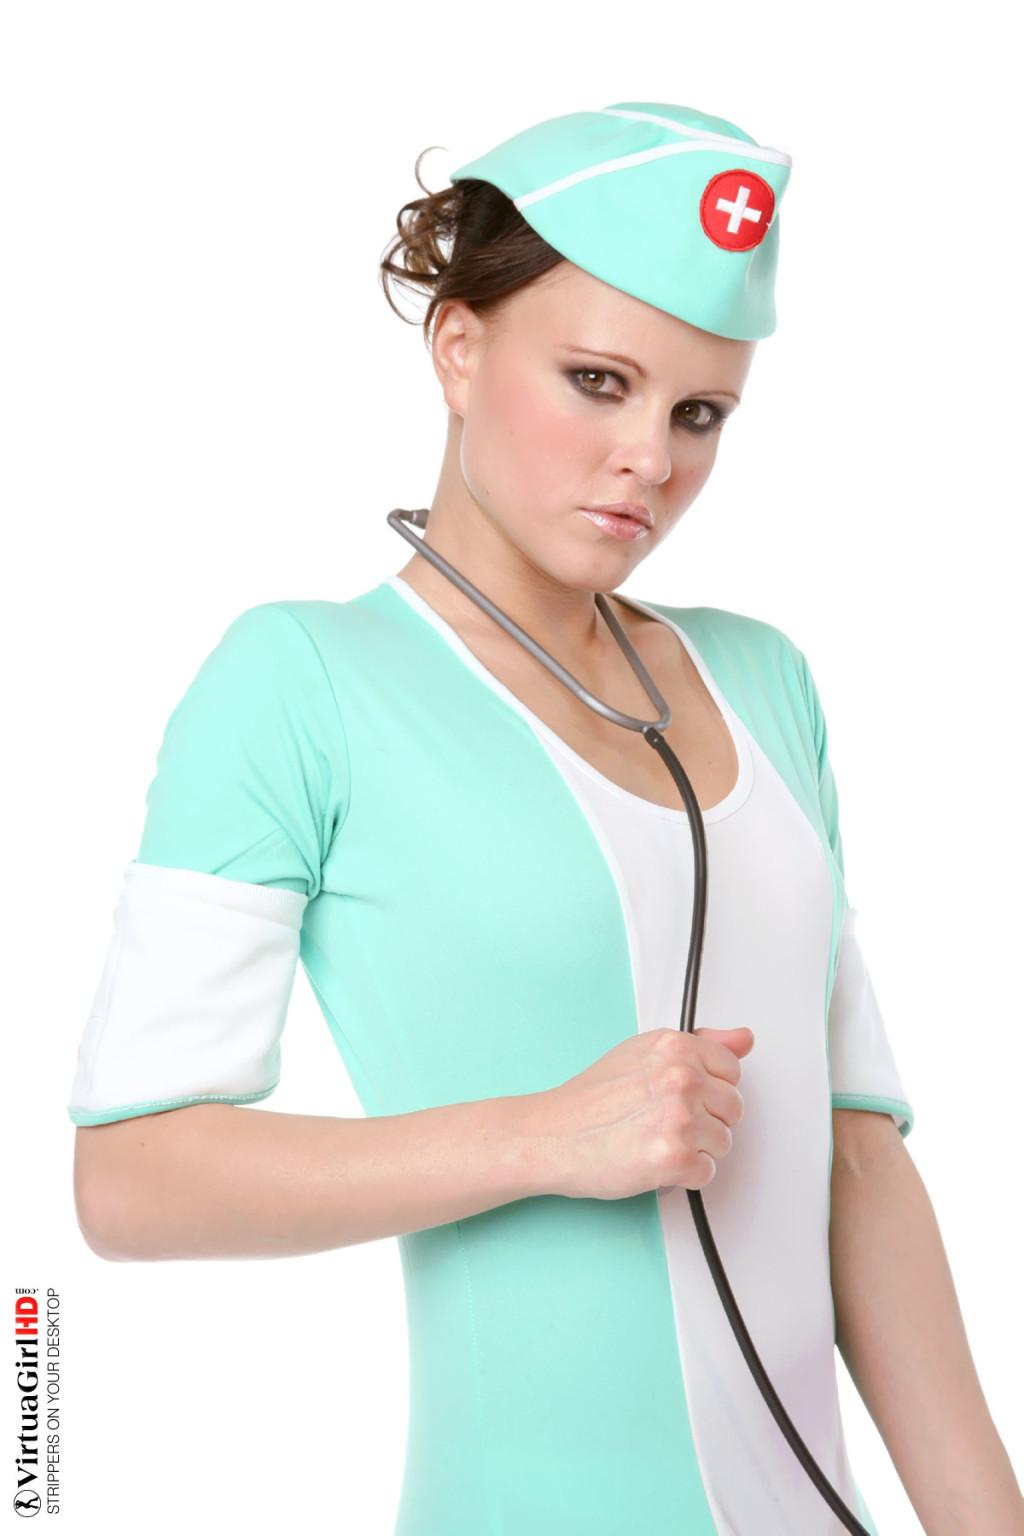 Monica Sweet - Медсестра - Порно галерея № 2490461